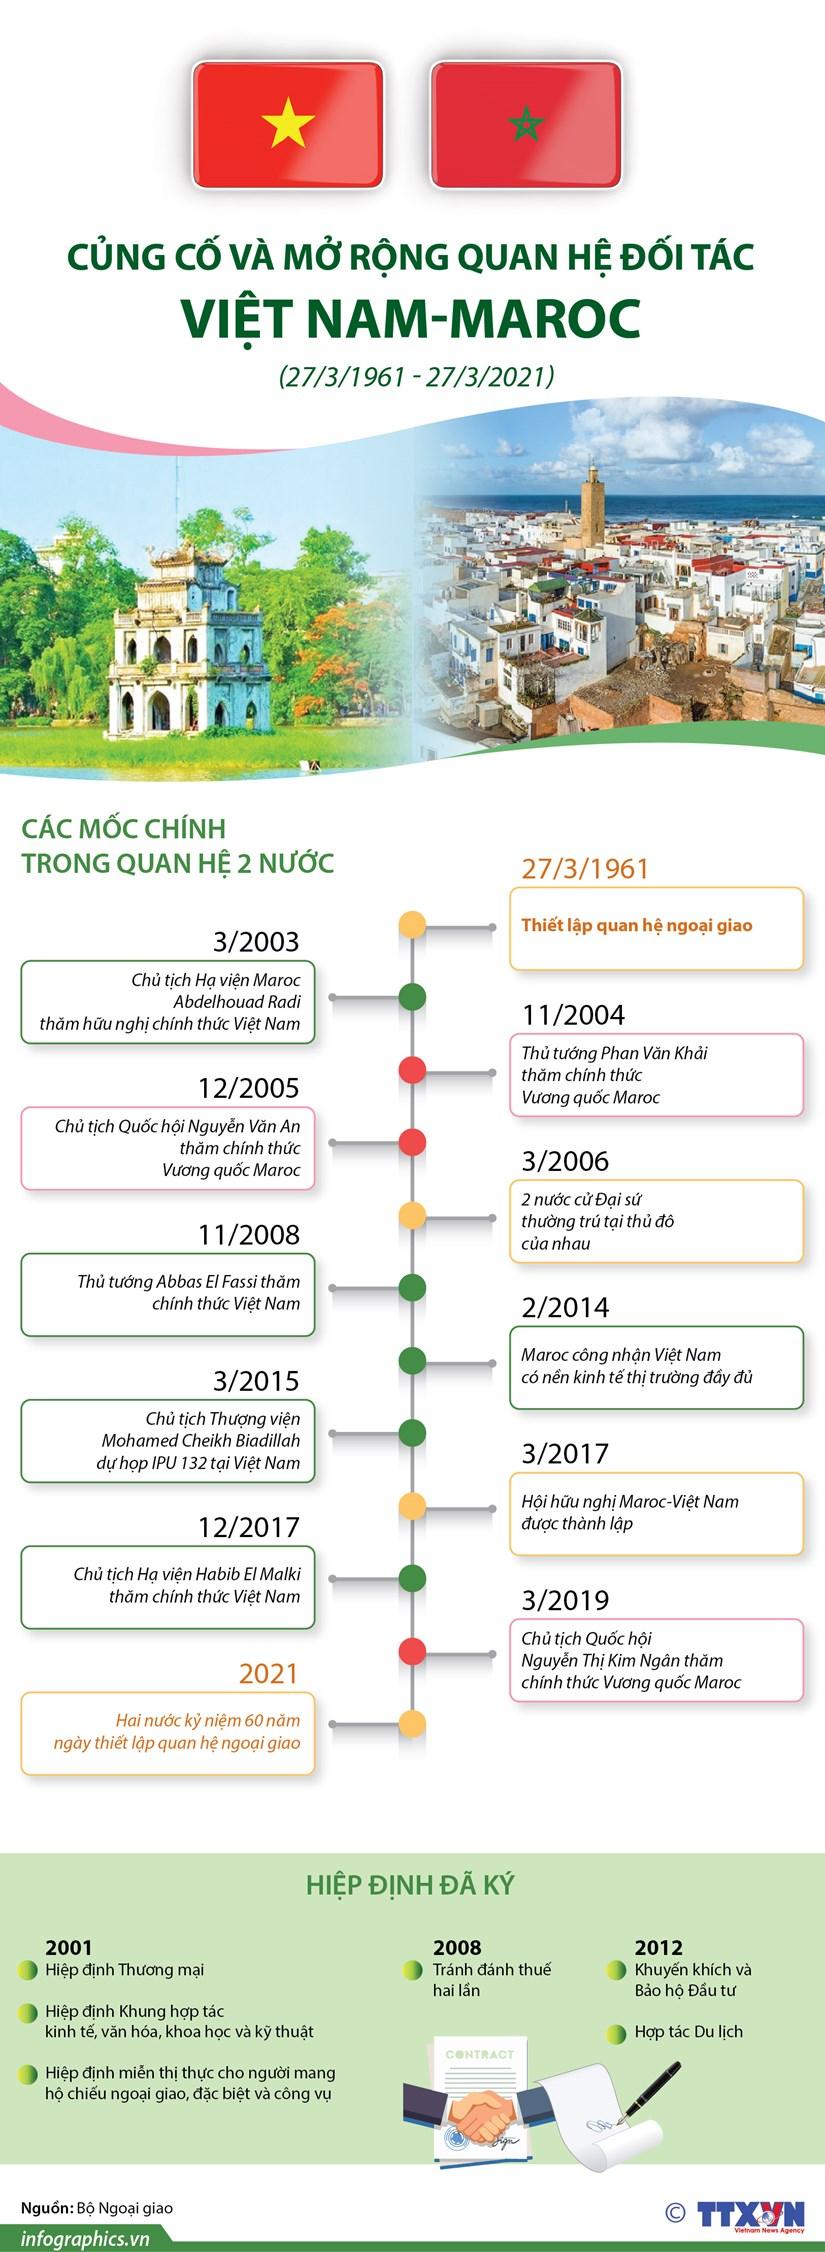 [Infographics] Cung co va mo rong quan he doi tac Viet Nam-Maroc hinh anh 1